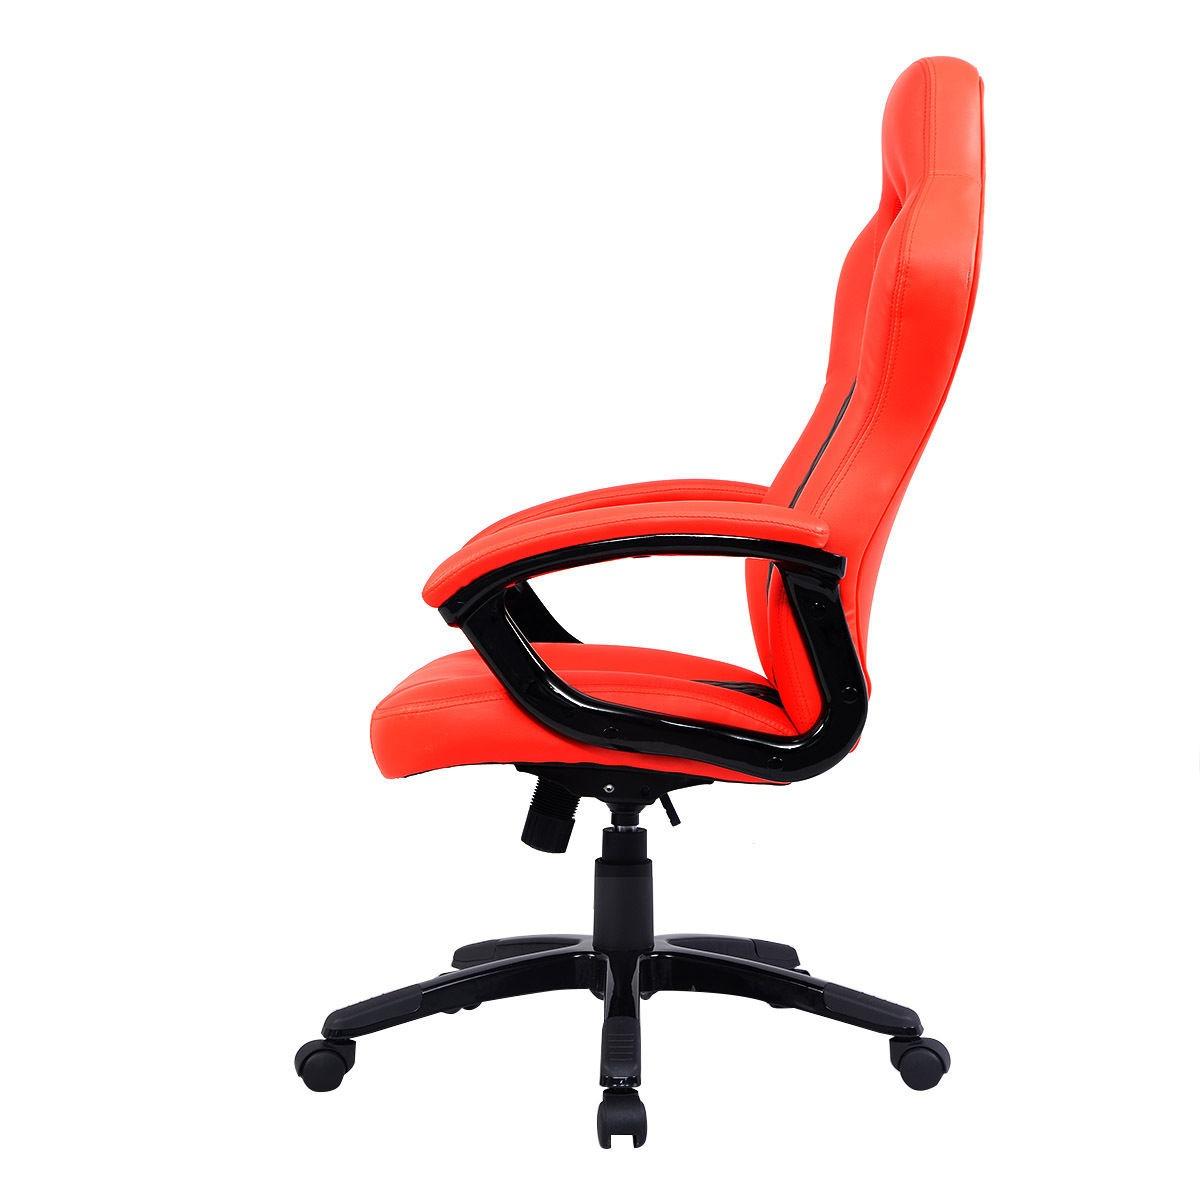 Silla ergonomica para oficina moderna escritorio vp0054 for Silla escritorio moderna